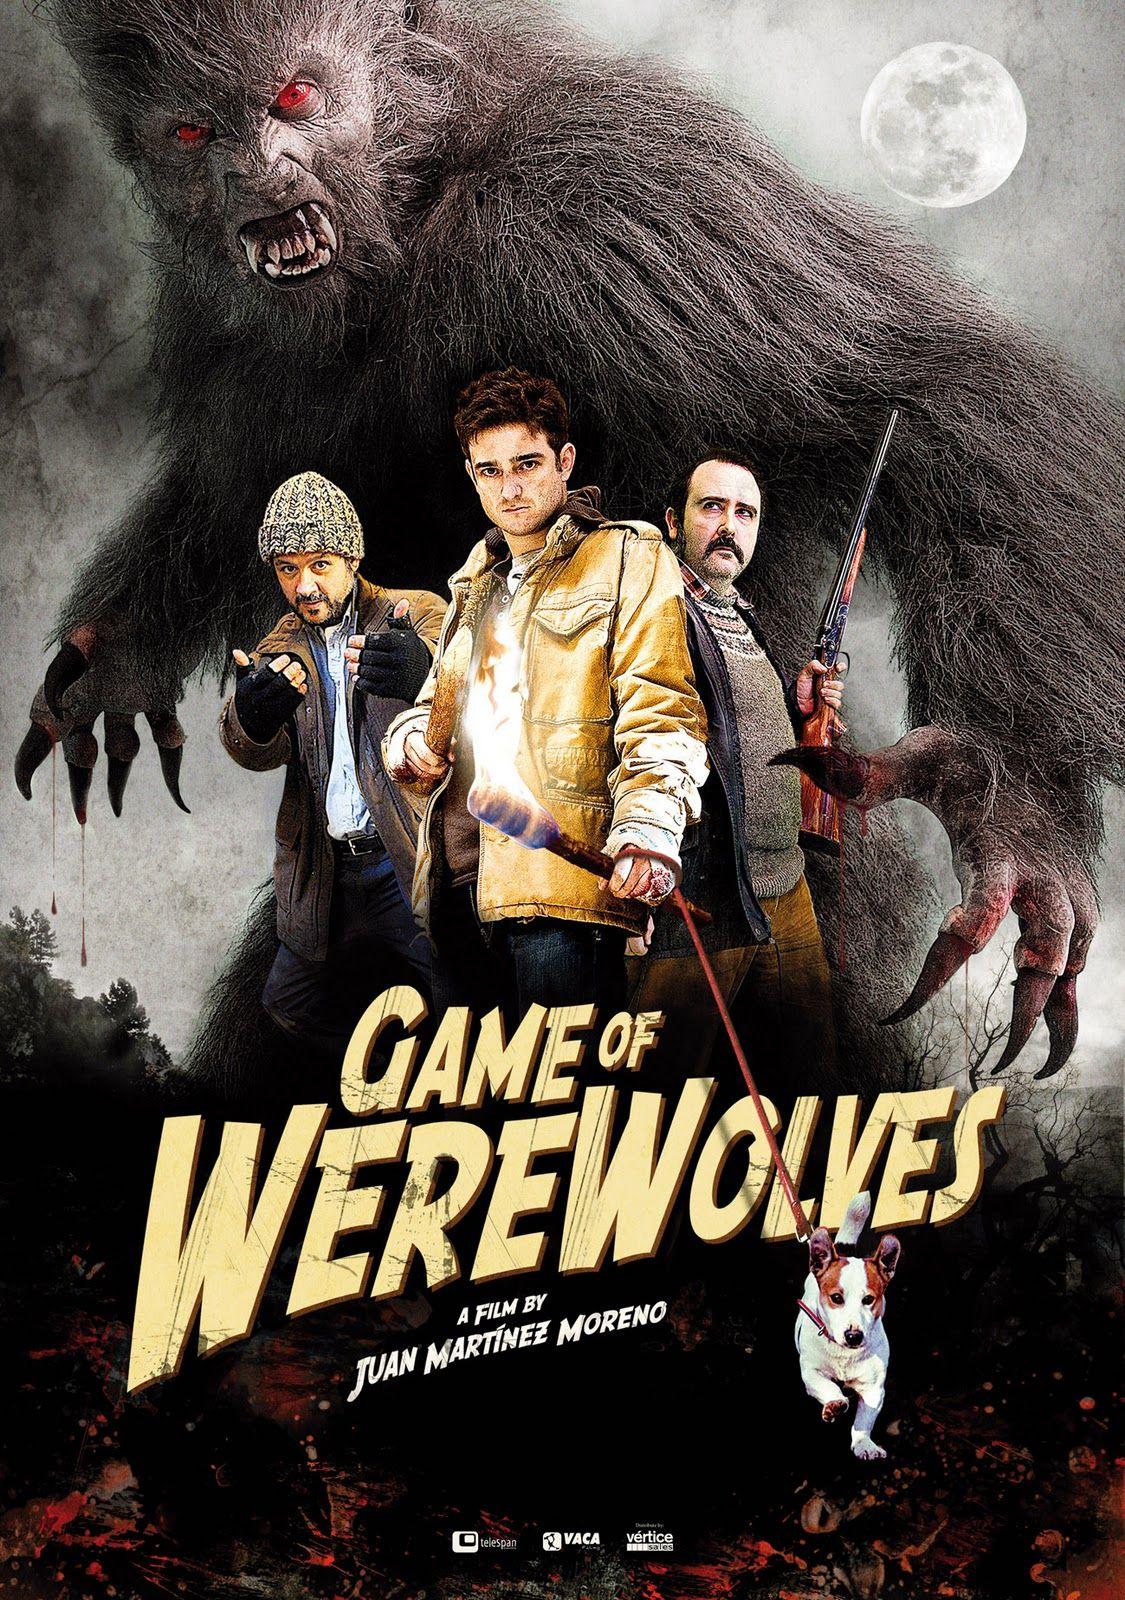 """Lobos de Arga,"" or game of werewolves, is a spanish"